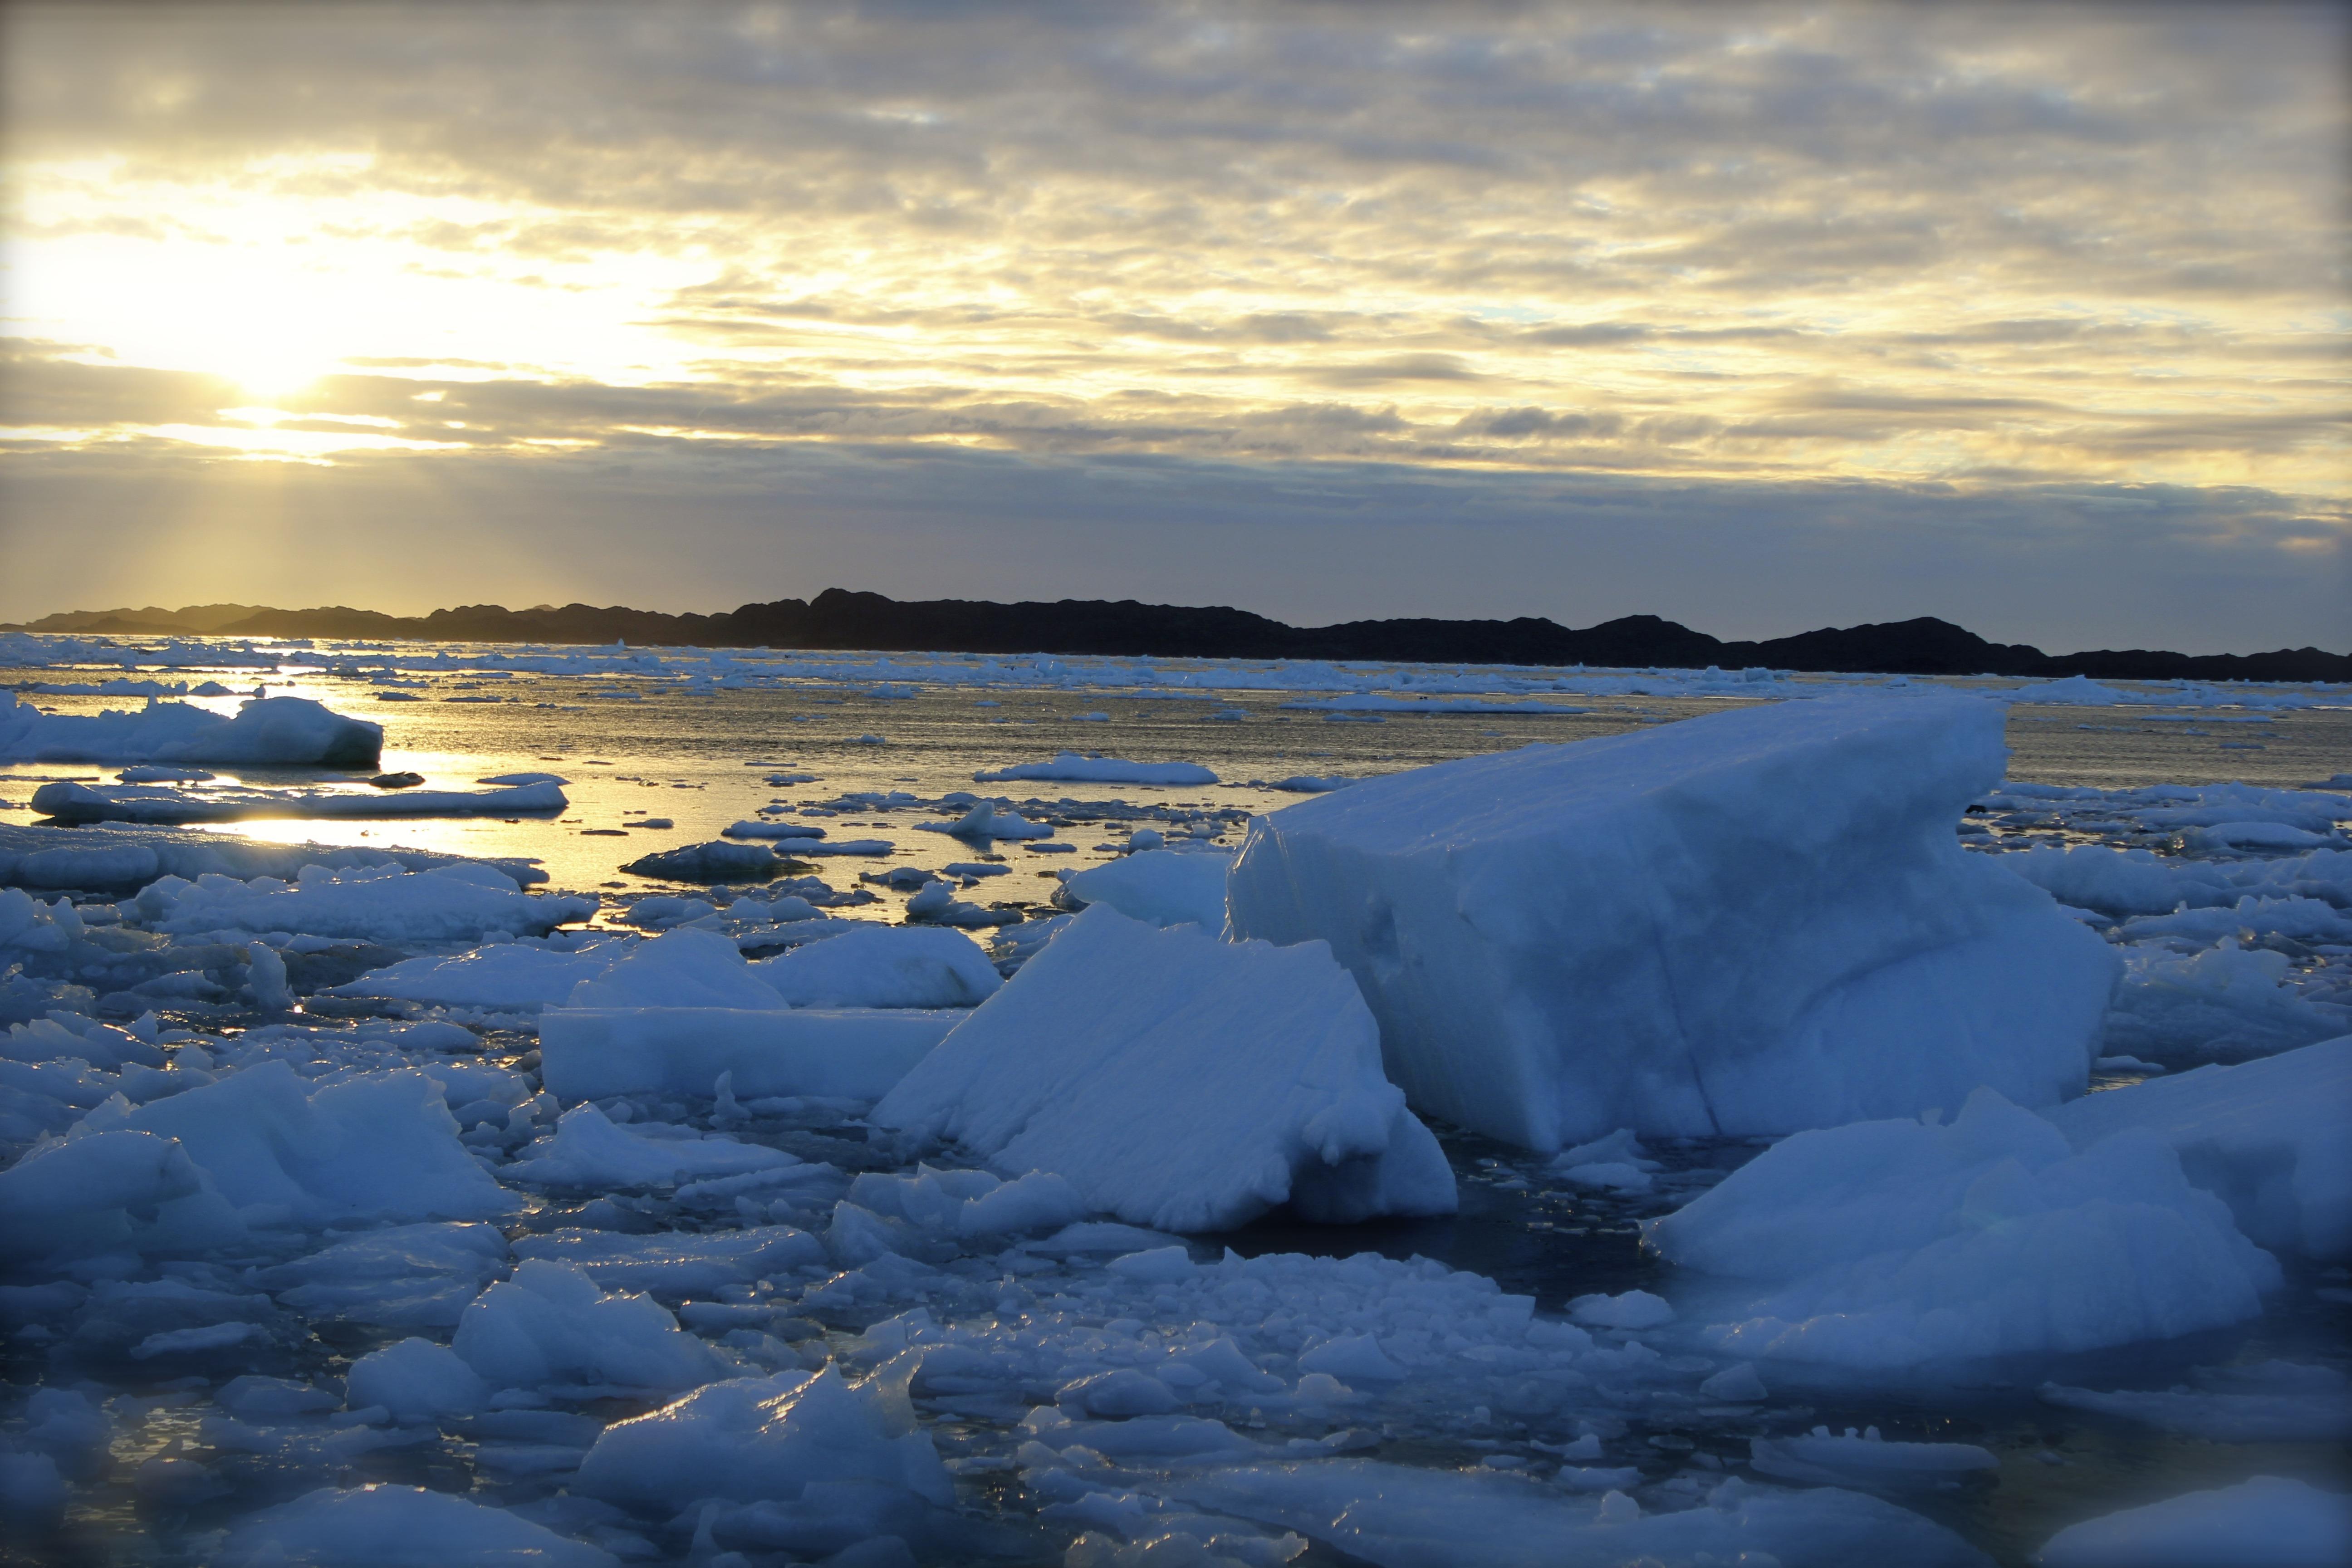 snow winter seasons sea - photo #6